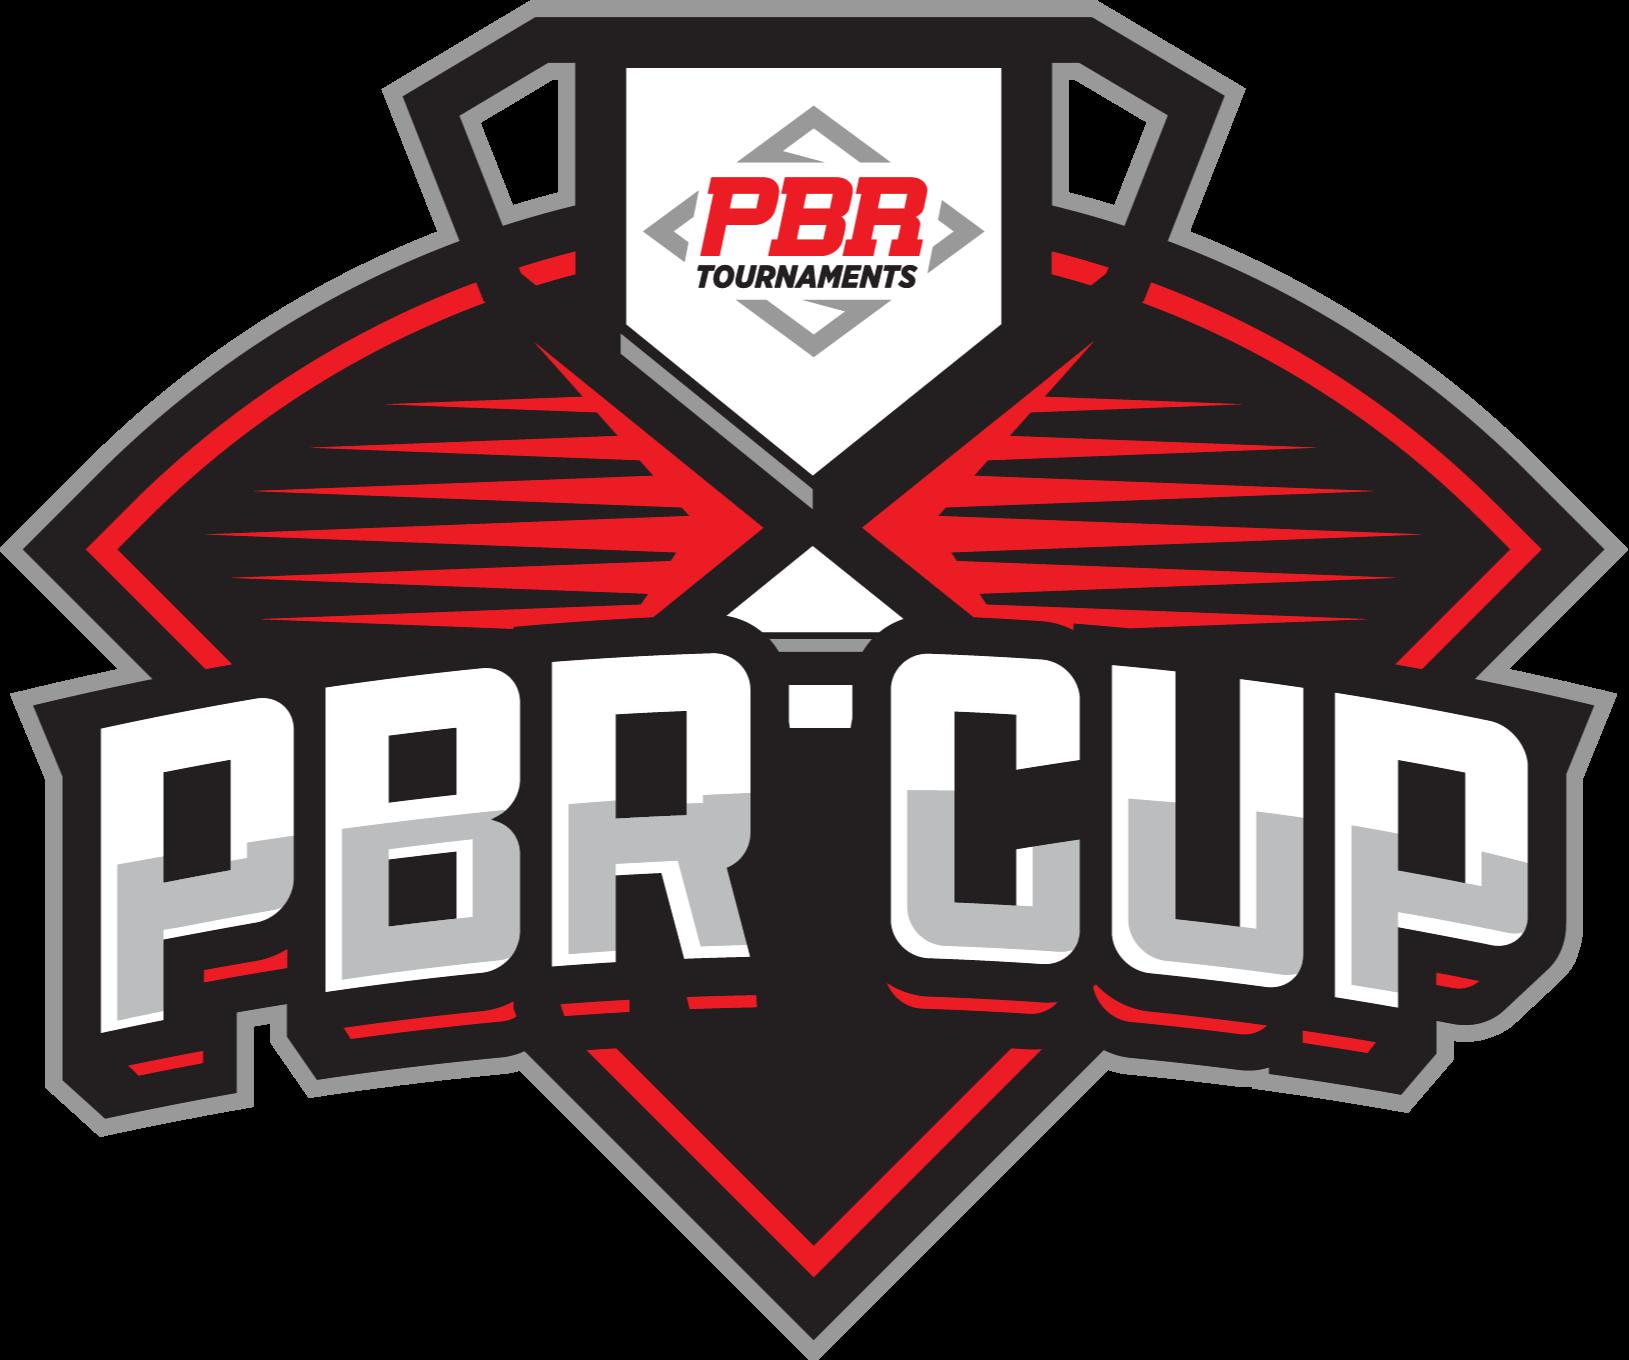 PBR Cup